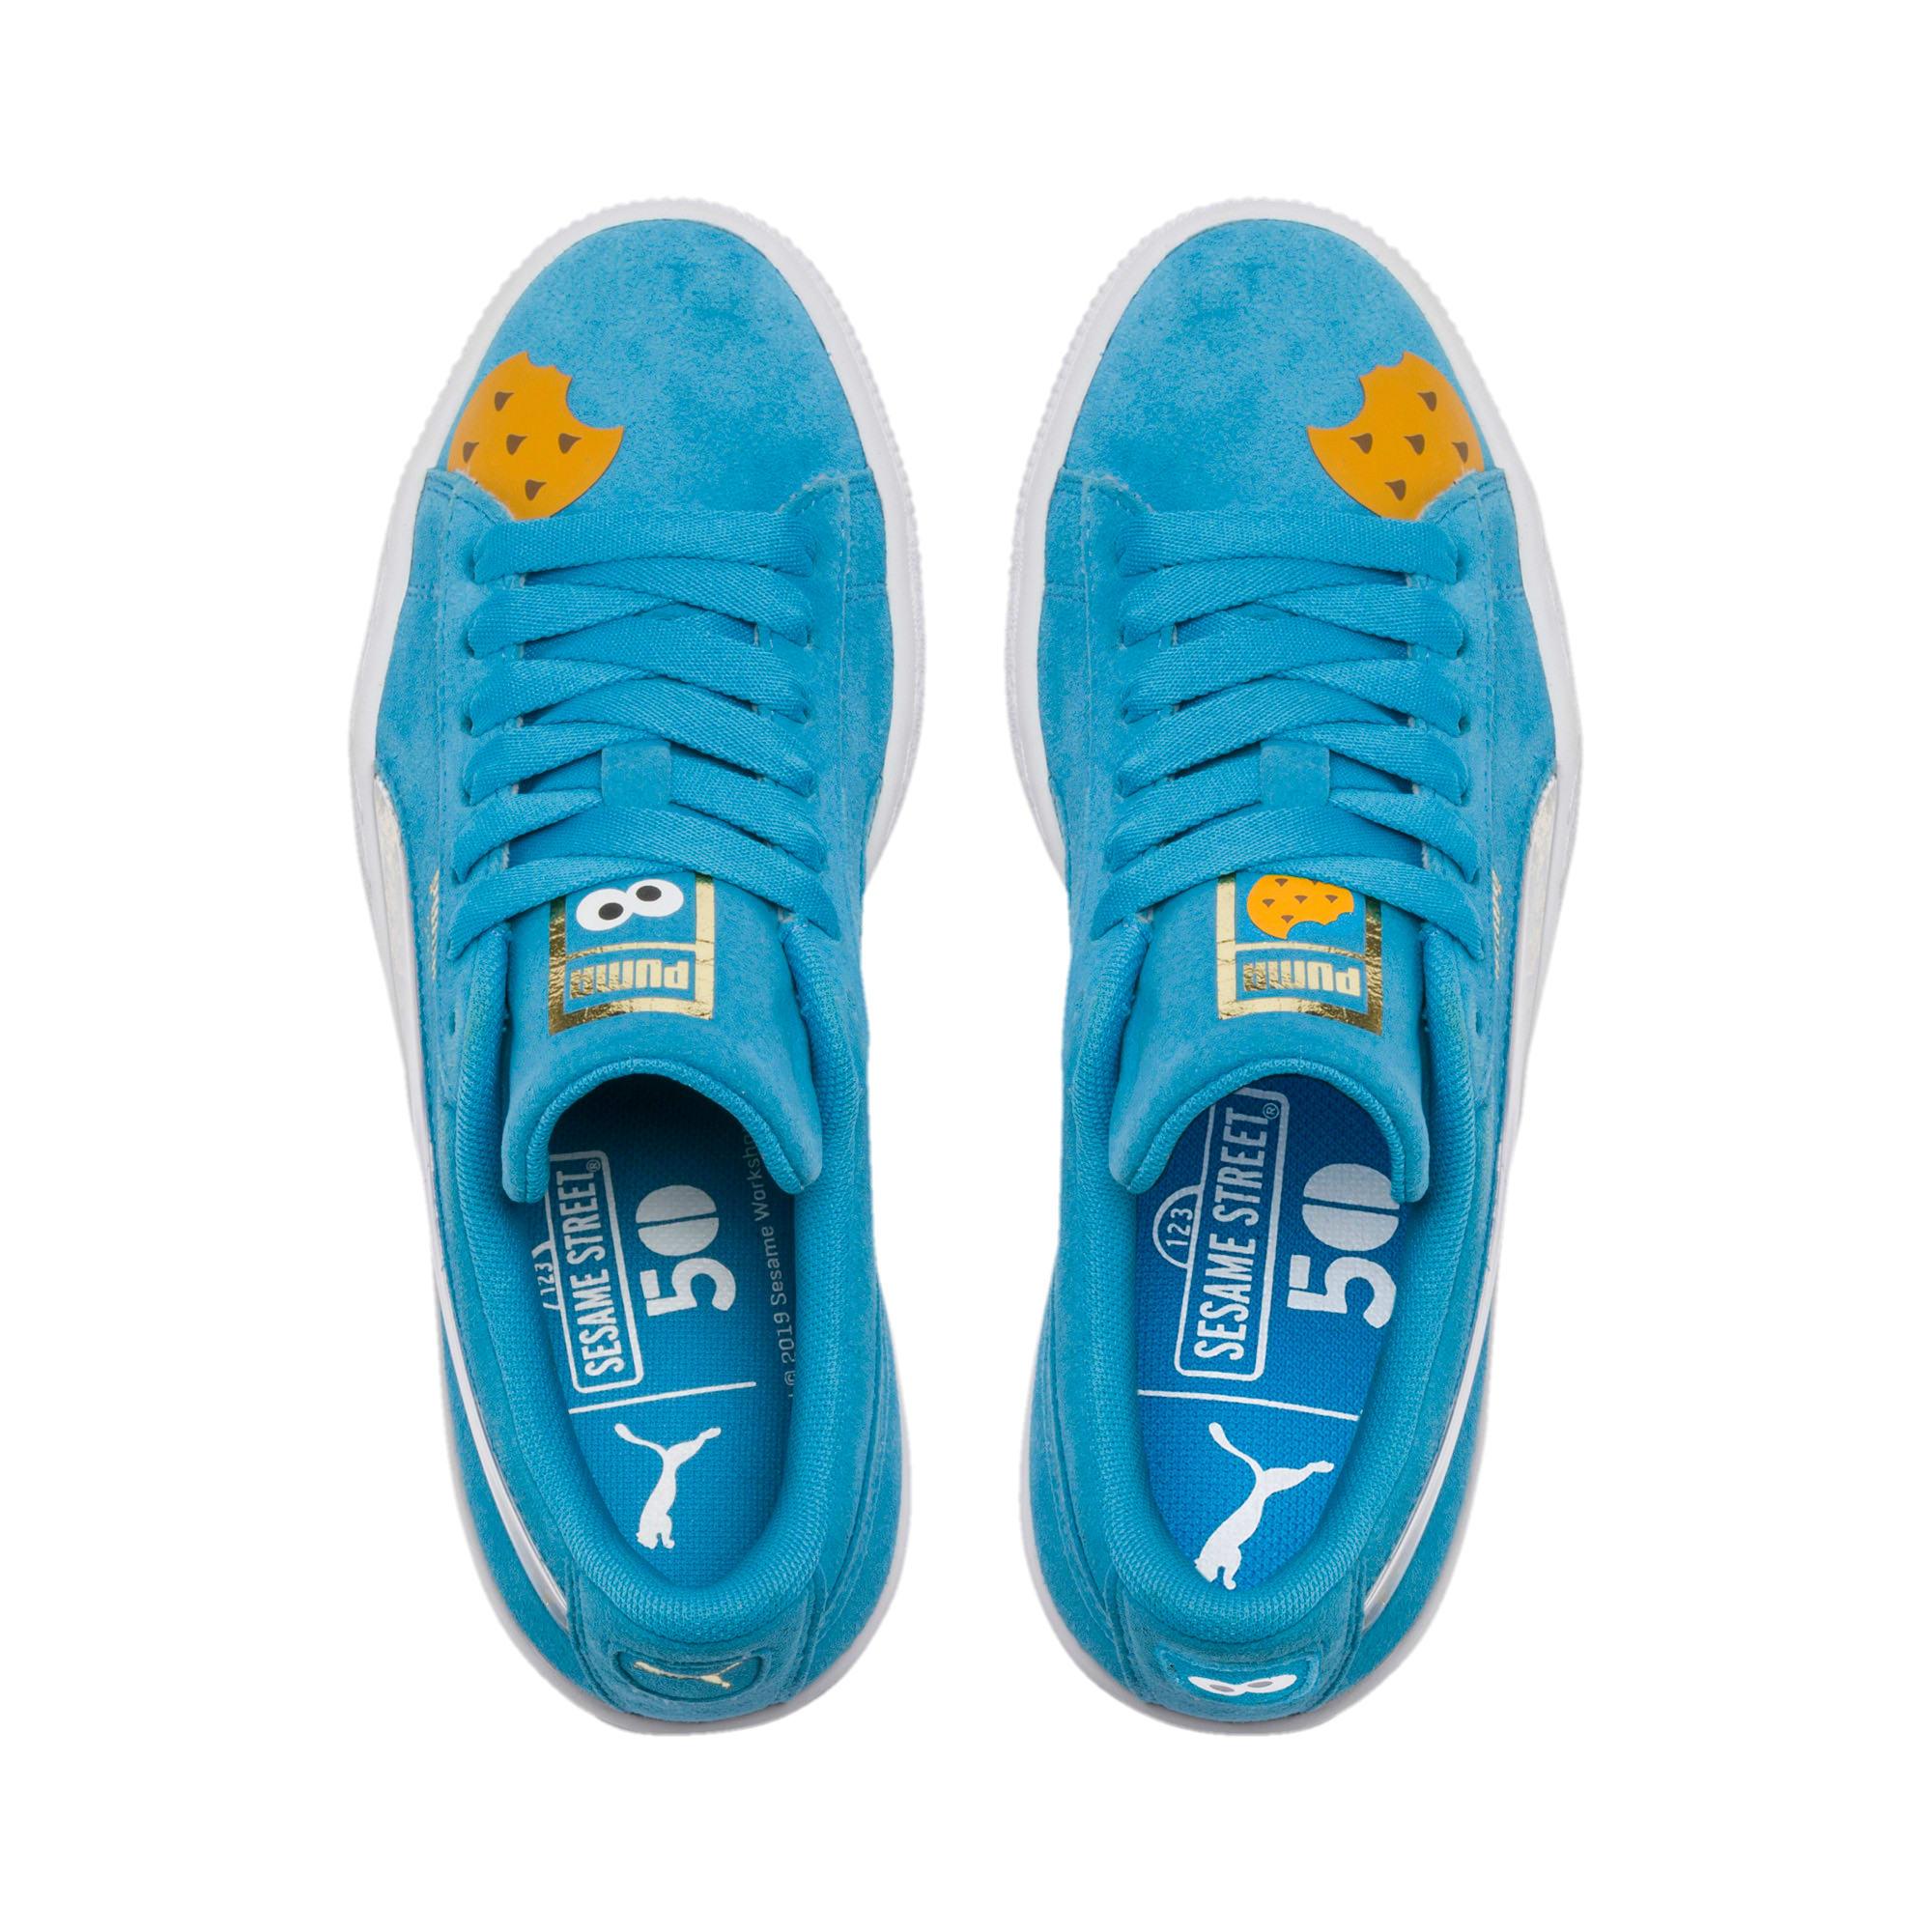 Thumbnail 6 of PUMA x SESAME STREET 50 Suede Statement Sneakers JR, Bleu Azur-Puma White, medium